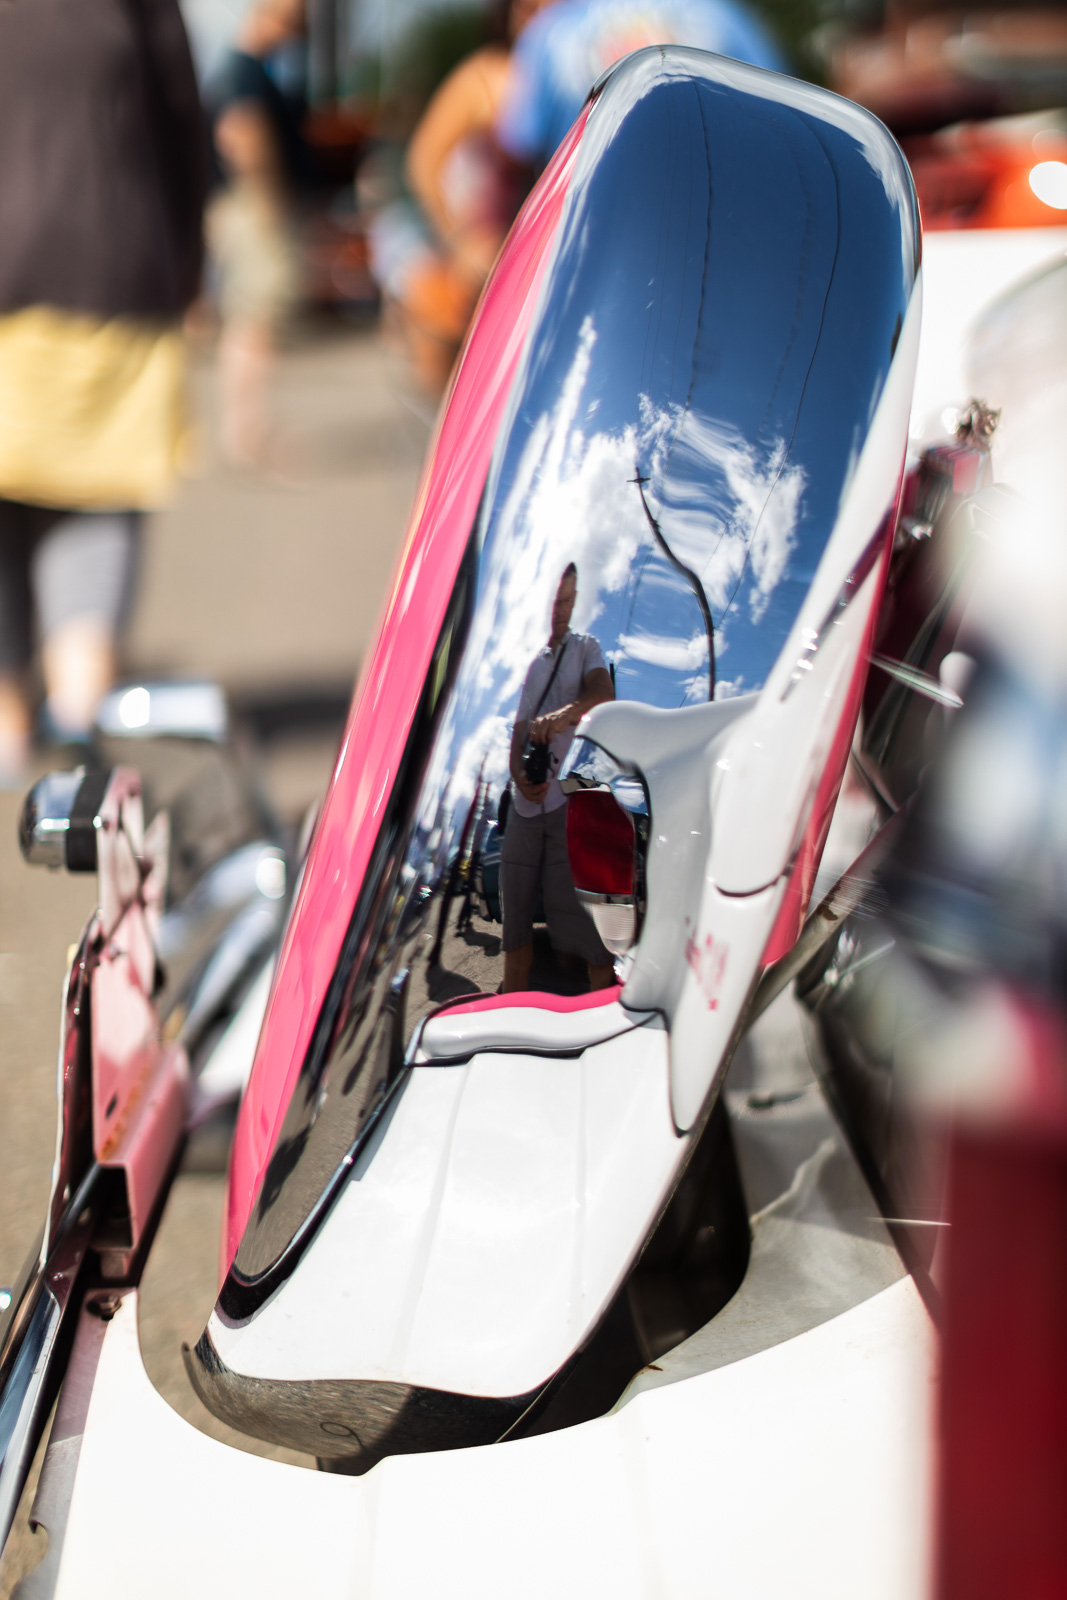 fat-guys-car-show-blog-19.jpg